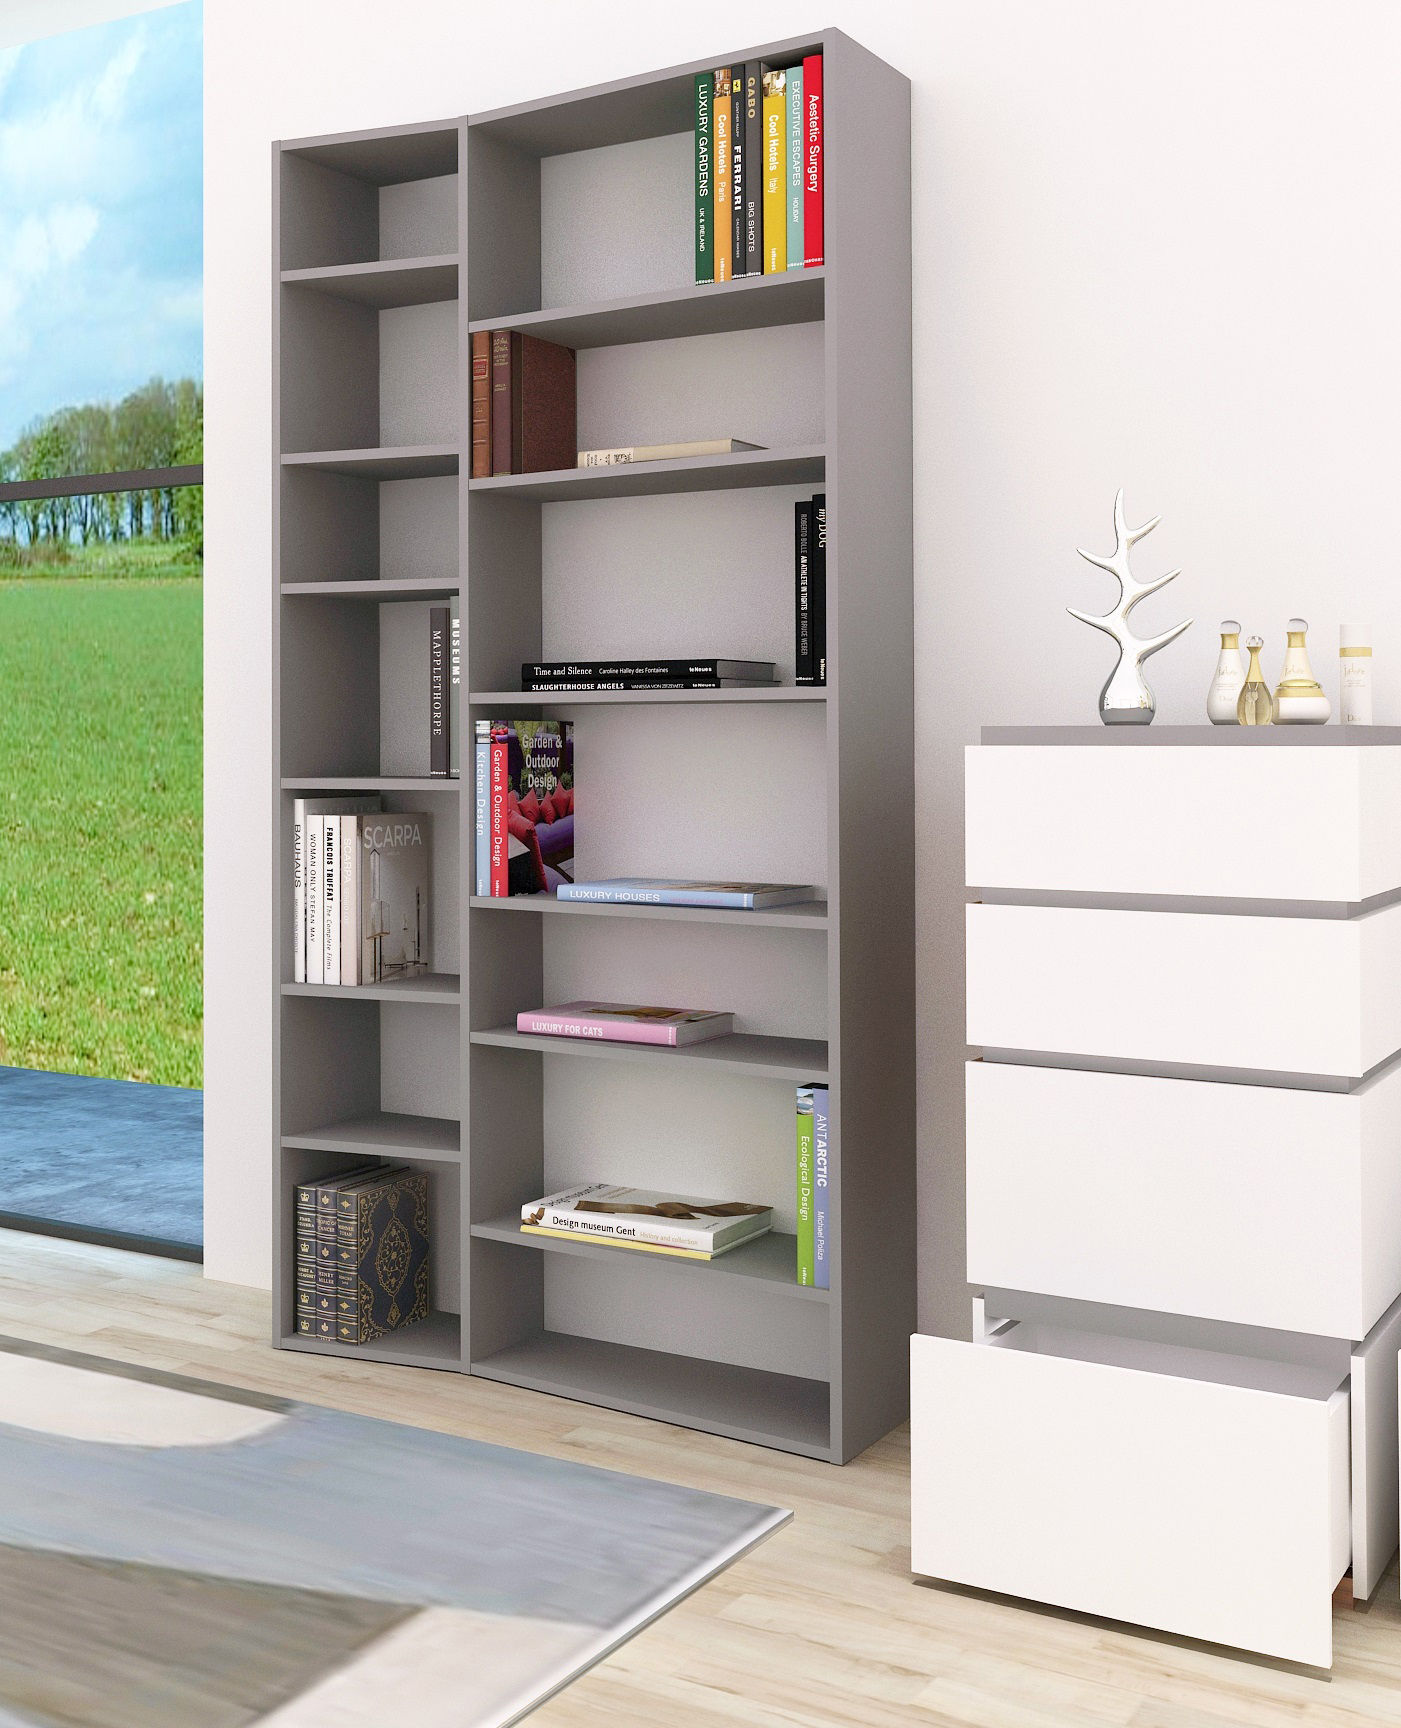 biblioth que new york 001 l 108 x h 224 cm gris pop up home made in design. Black Bedroom Furniture Sets. Home Design Ideas